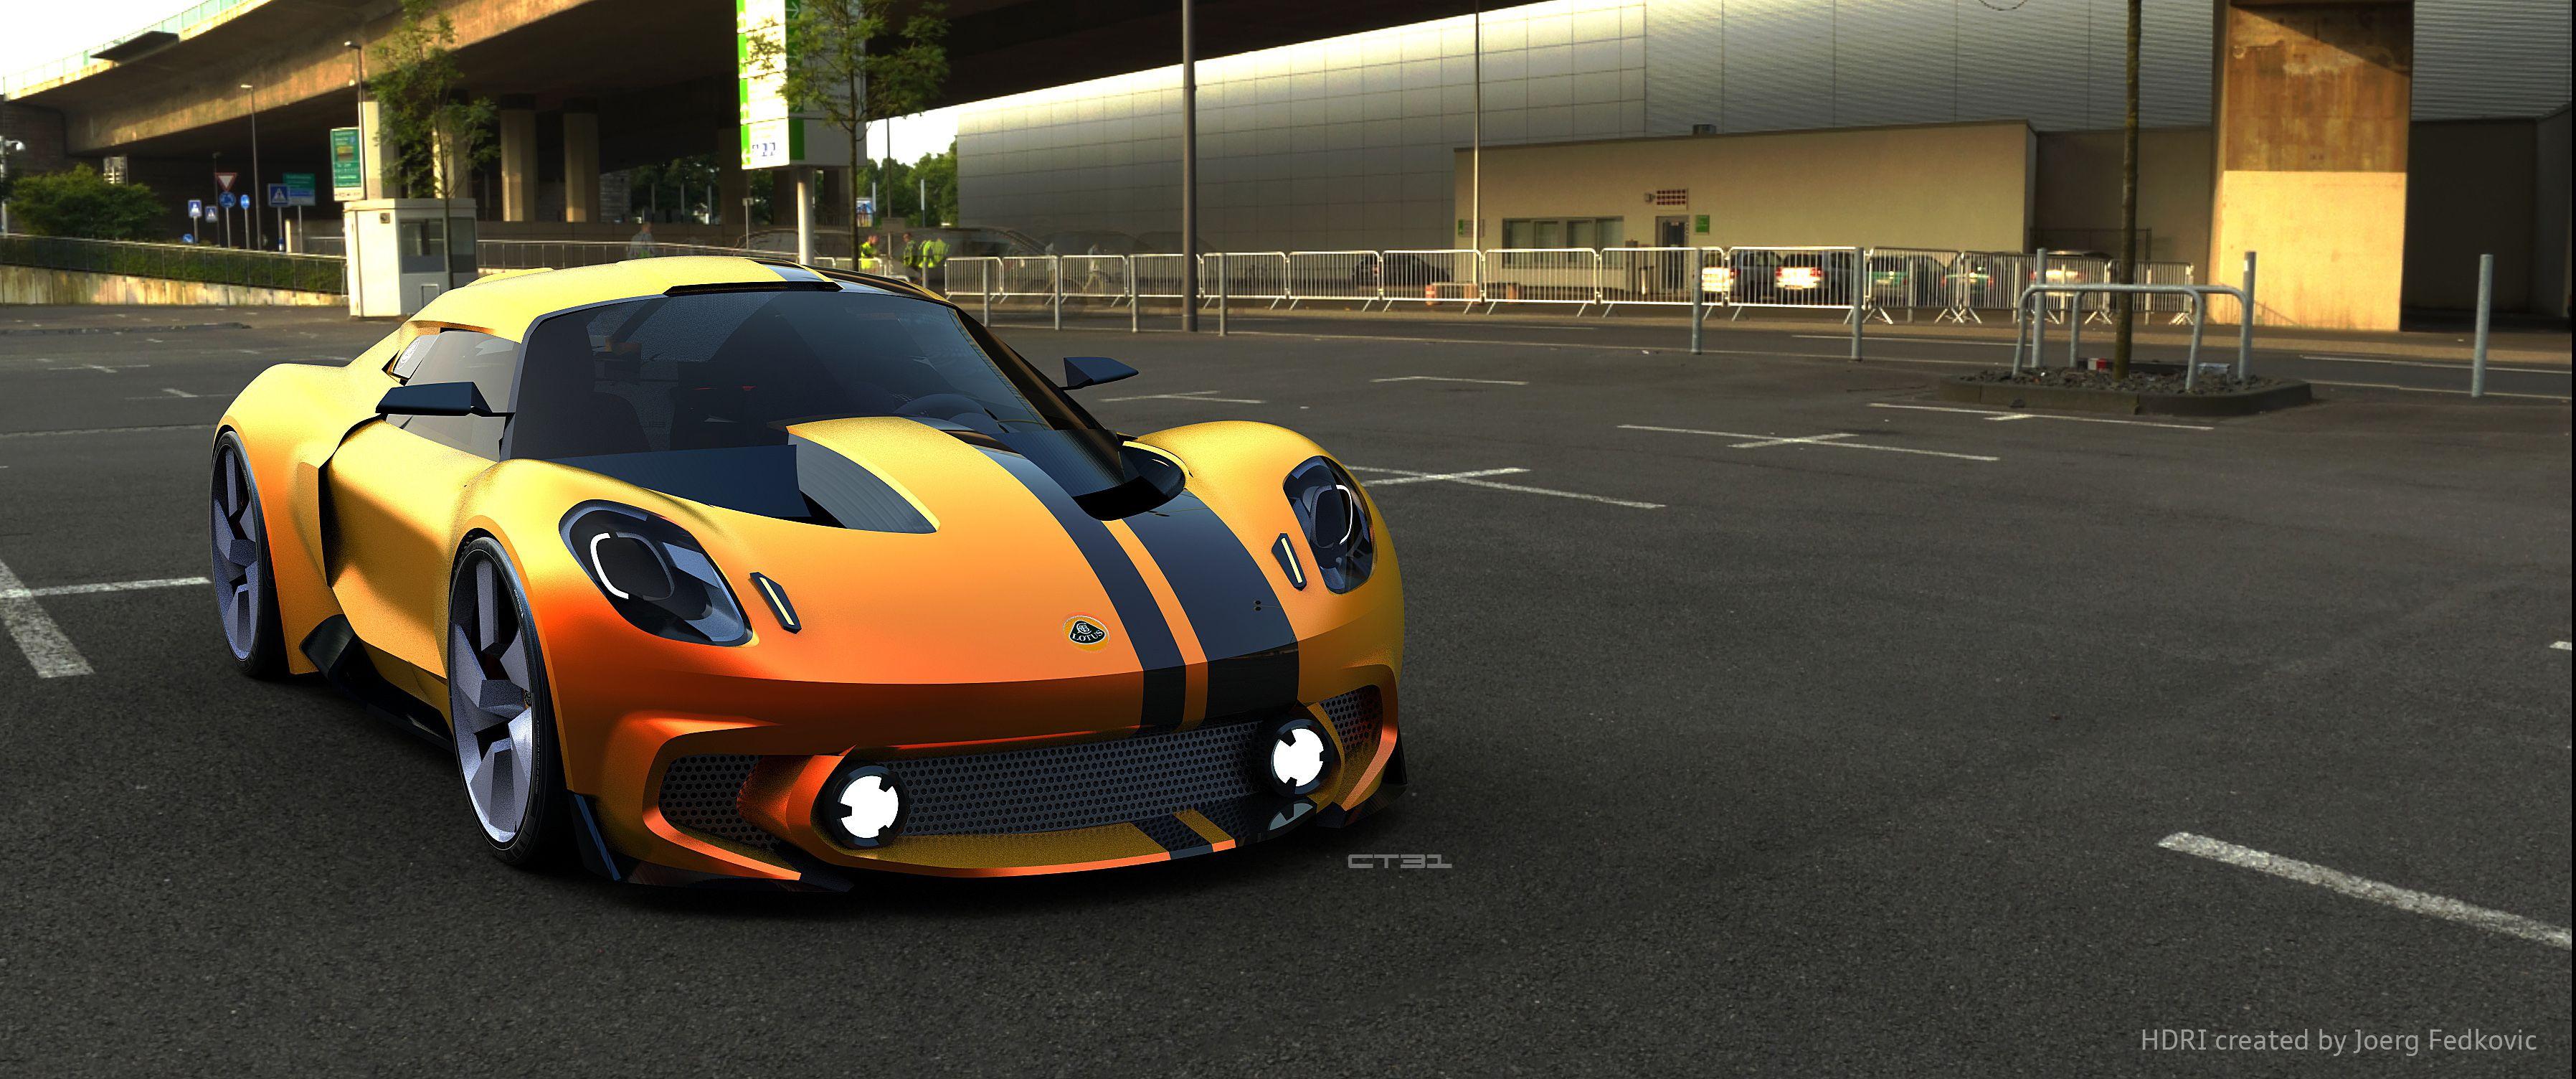 Lotus Elise Mk3 Auta